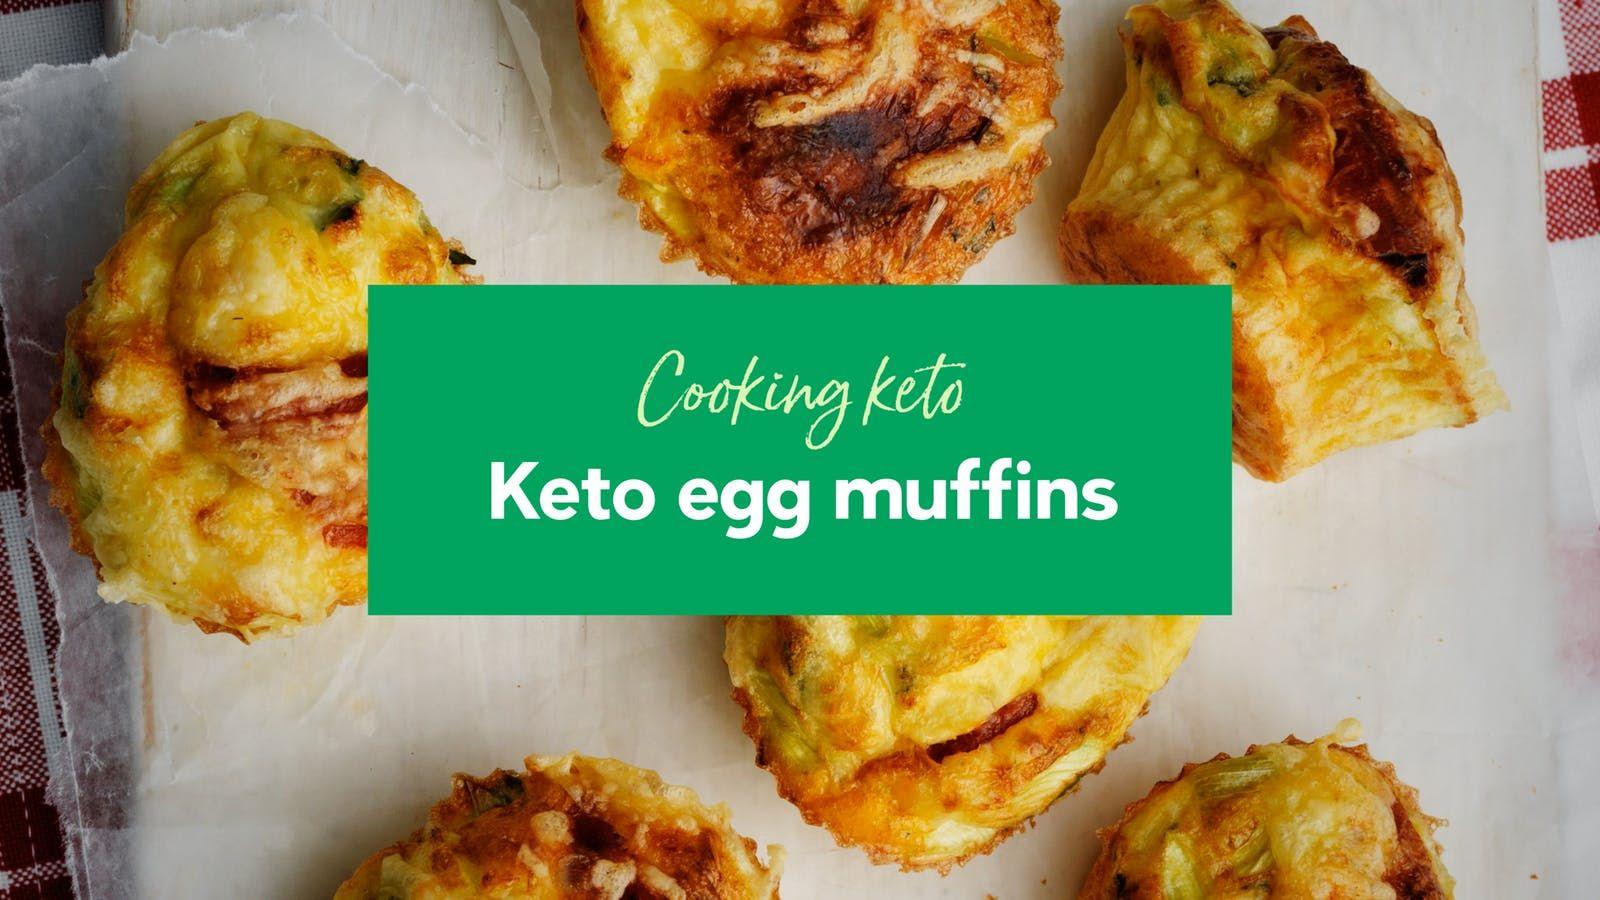 Keto Egg Muffins Keto Egg Muffins Egg Muffins Muffins